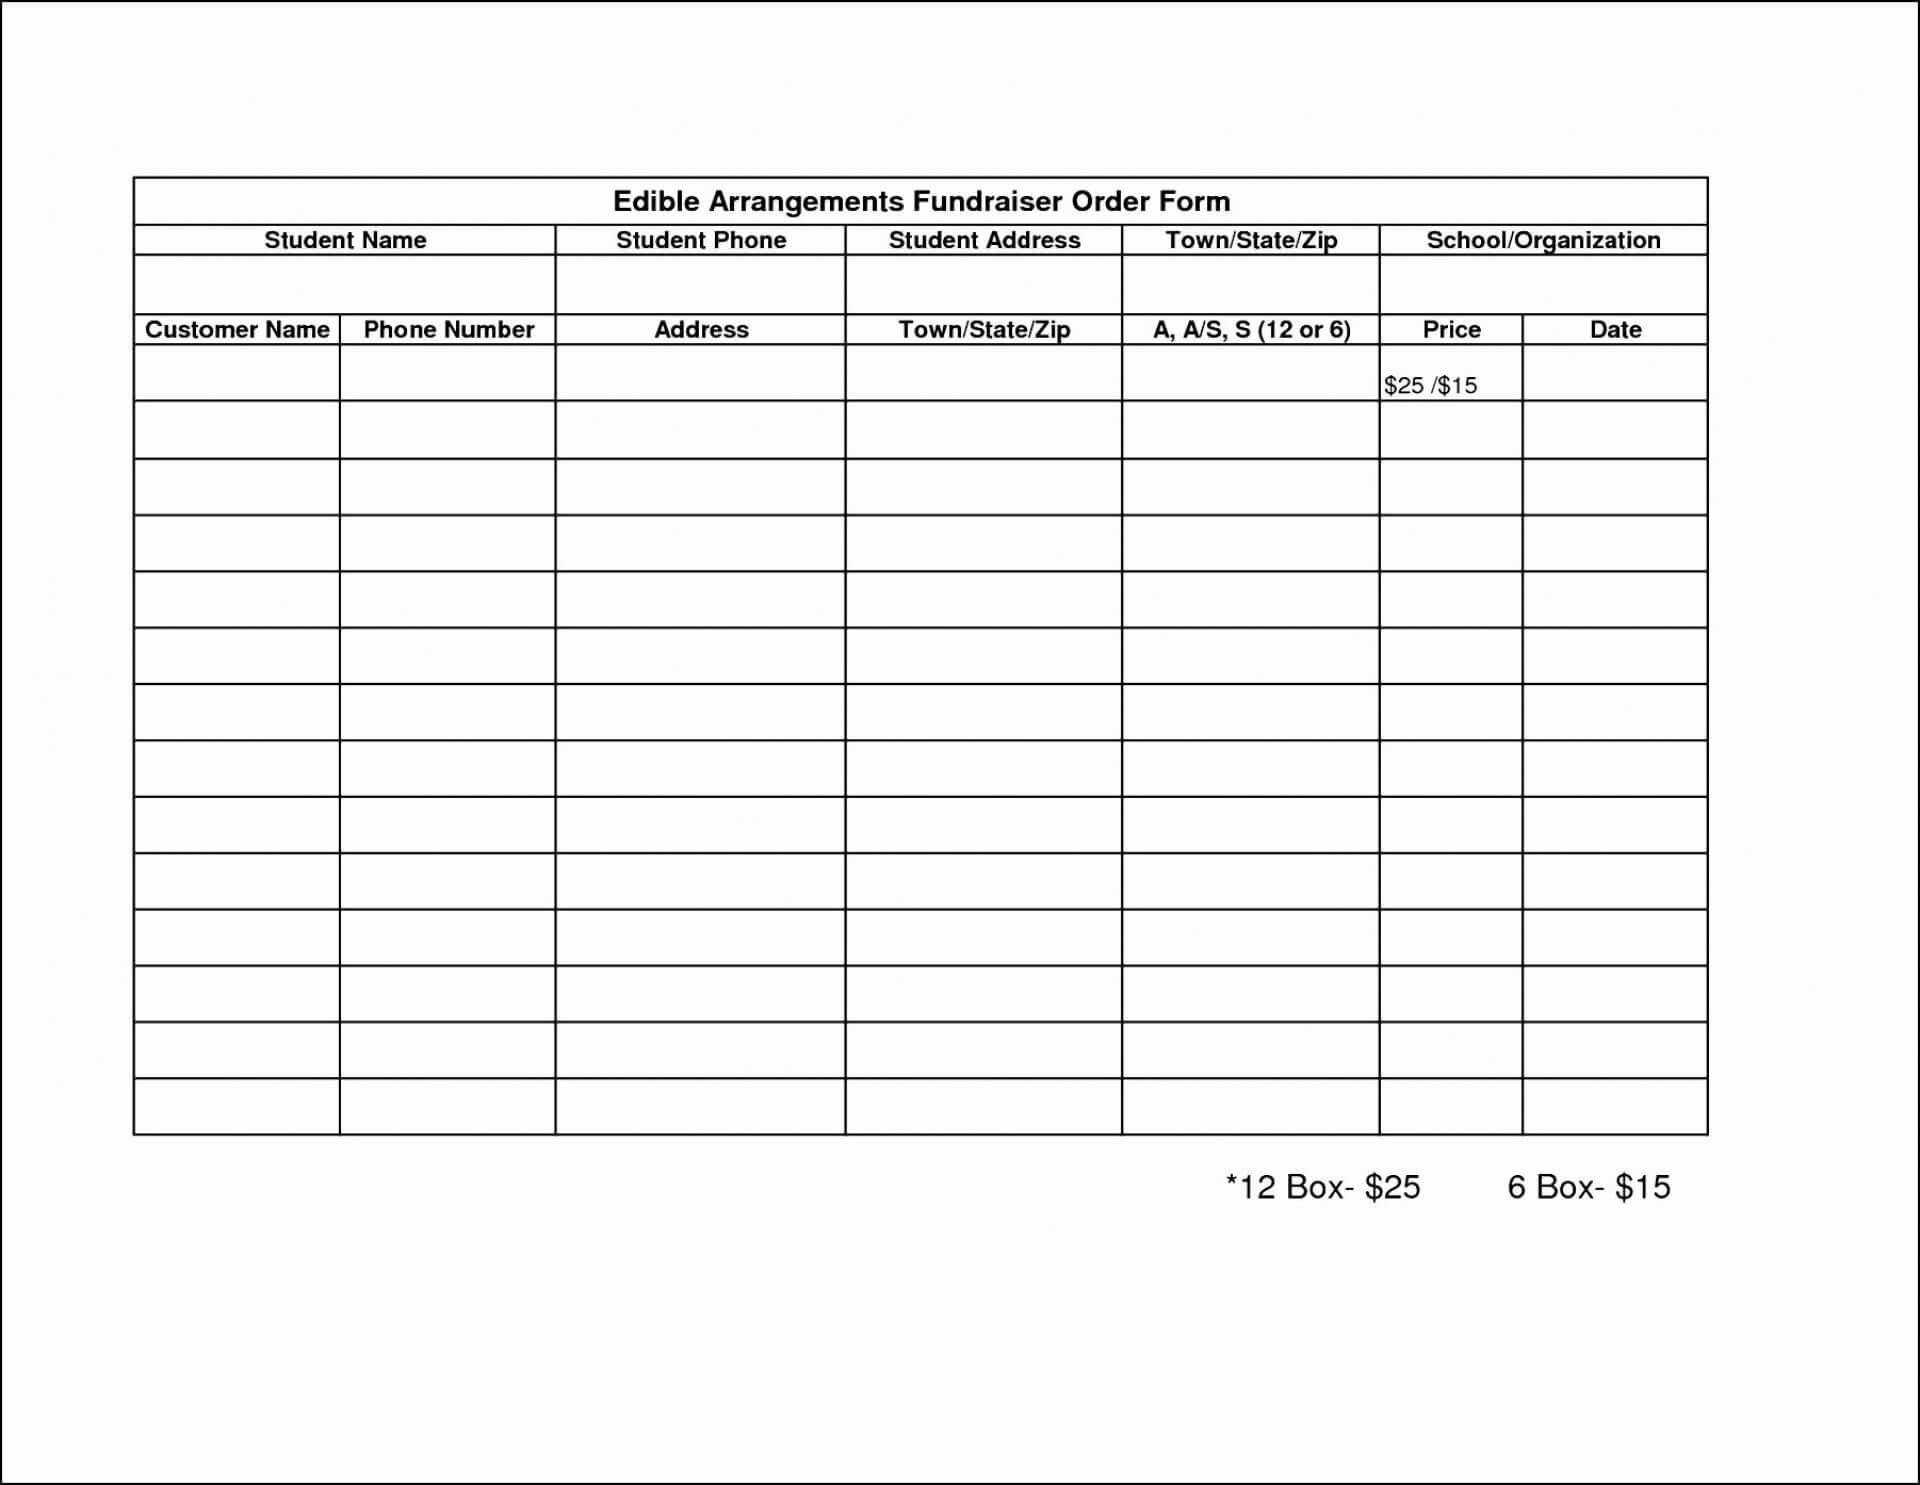 001 Template Ideas Blank Fundraiser Order Form Formidable Regarding Blank Fundraiser Order Form Template